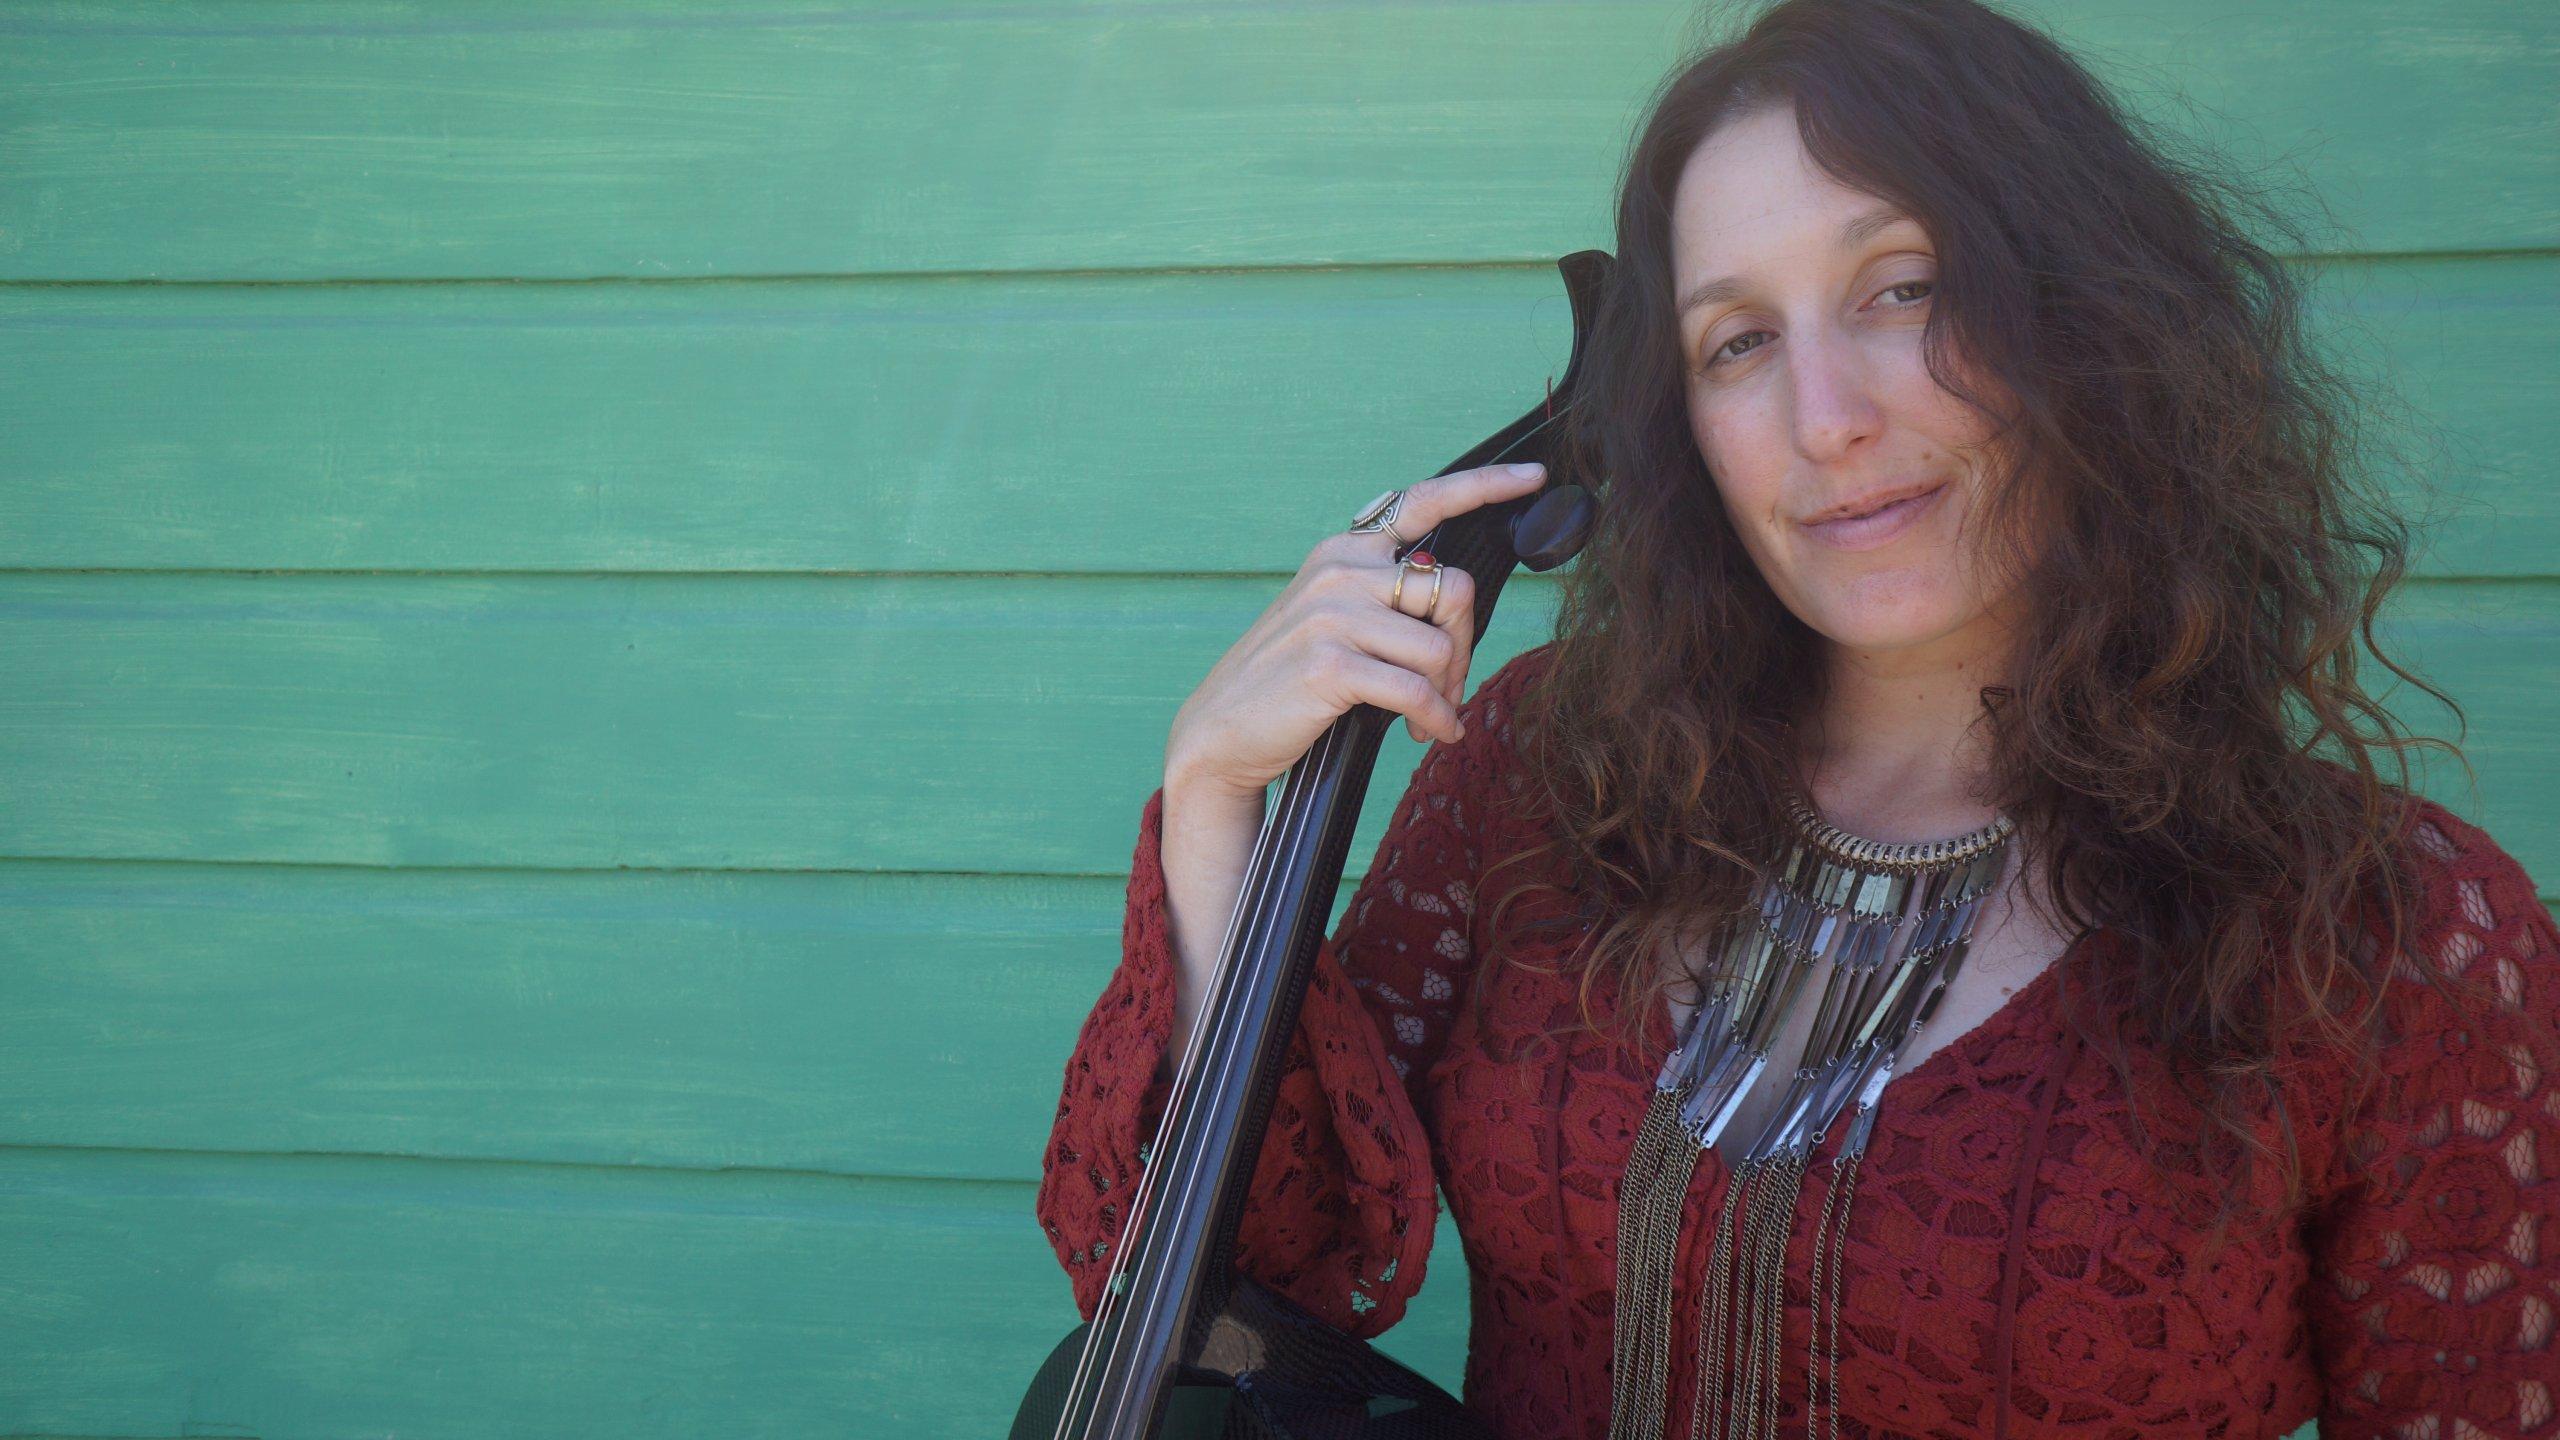 Rebecca-Roudman-of-Dirty-Cello